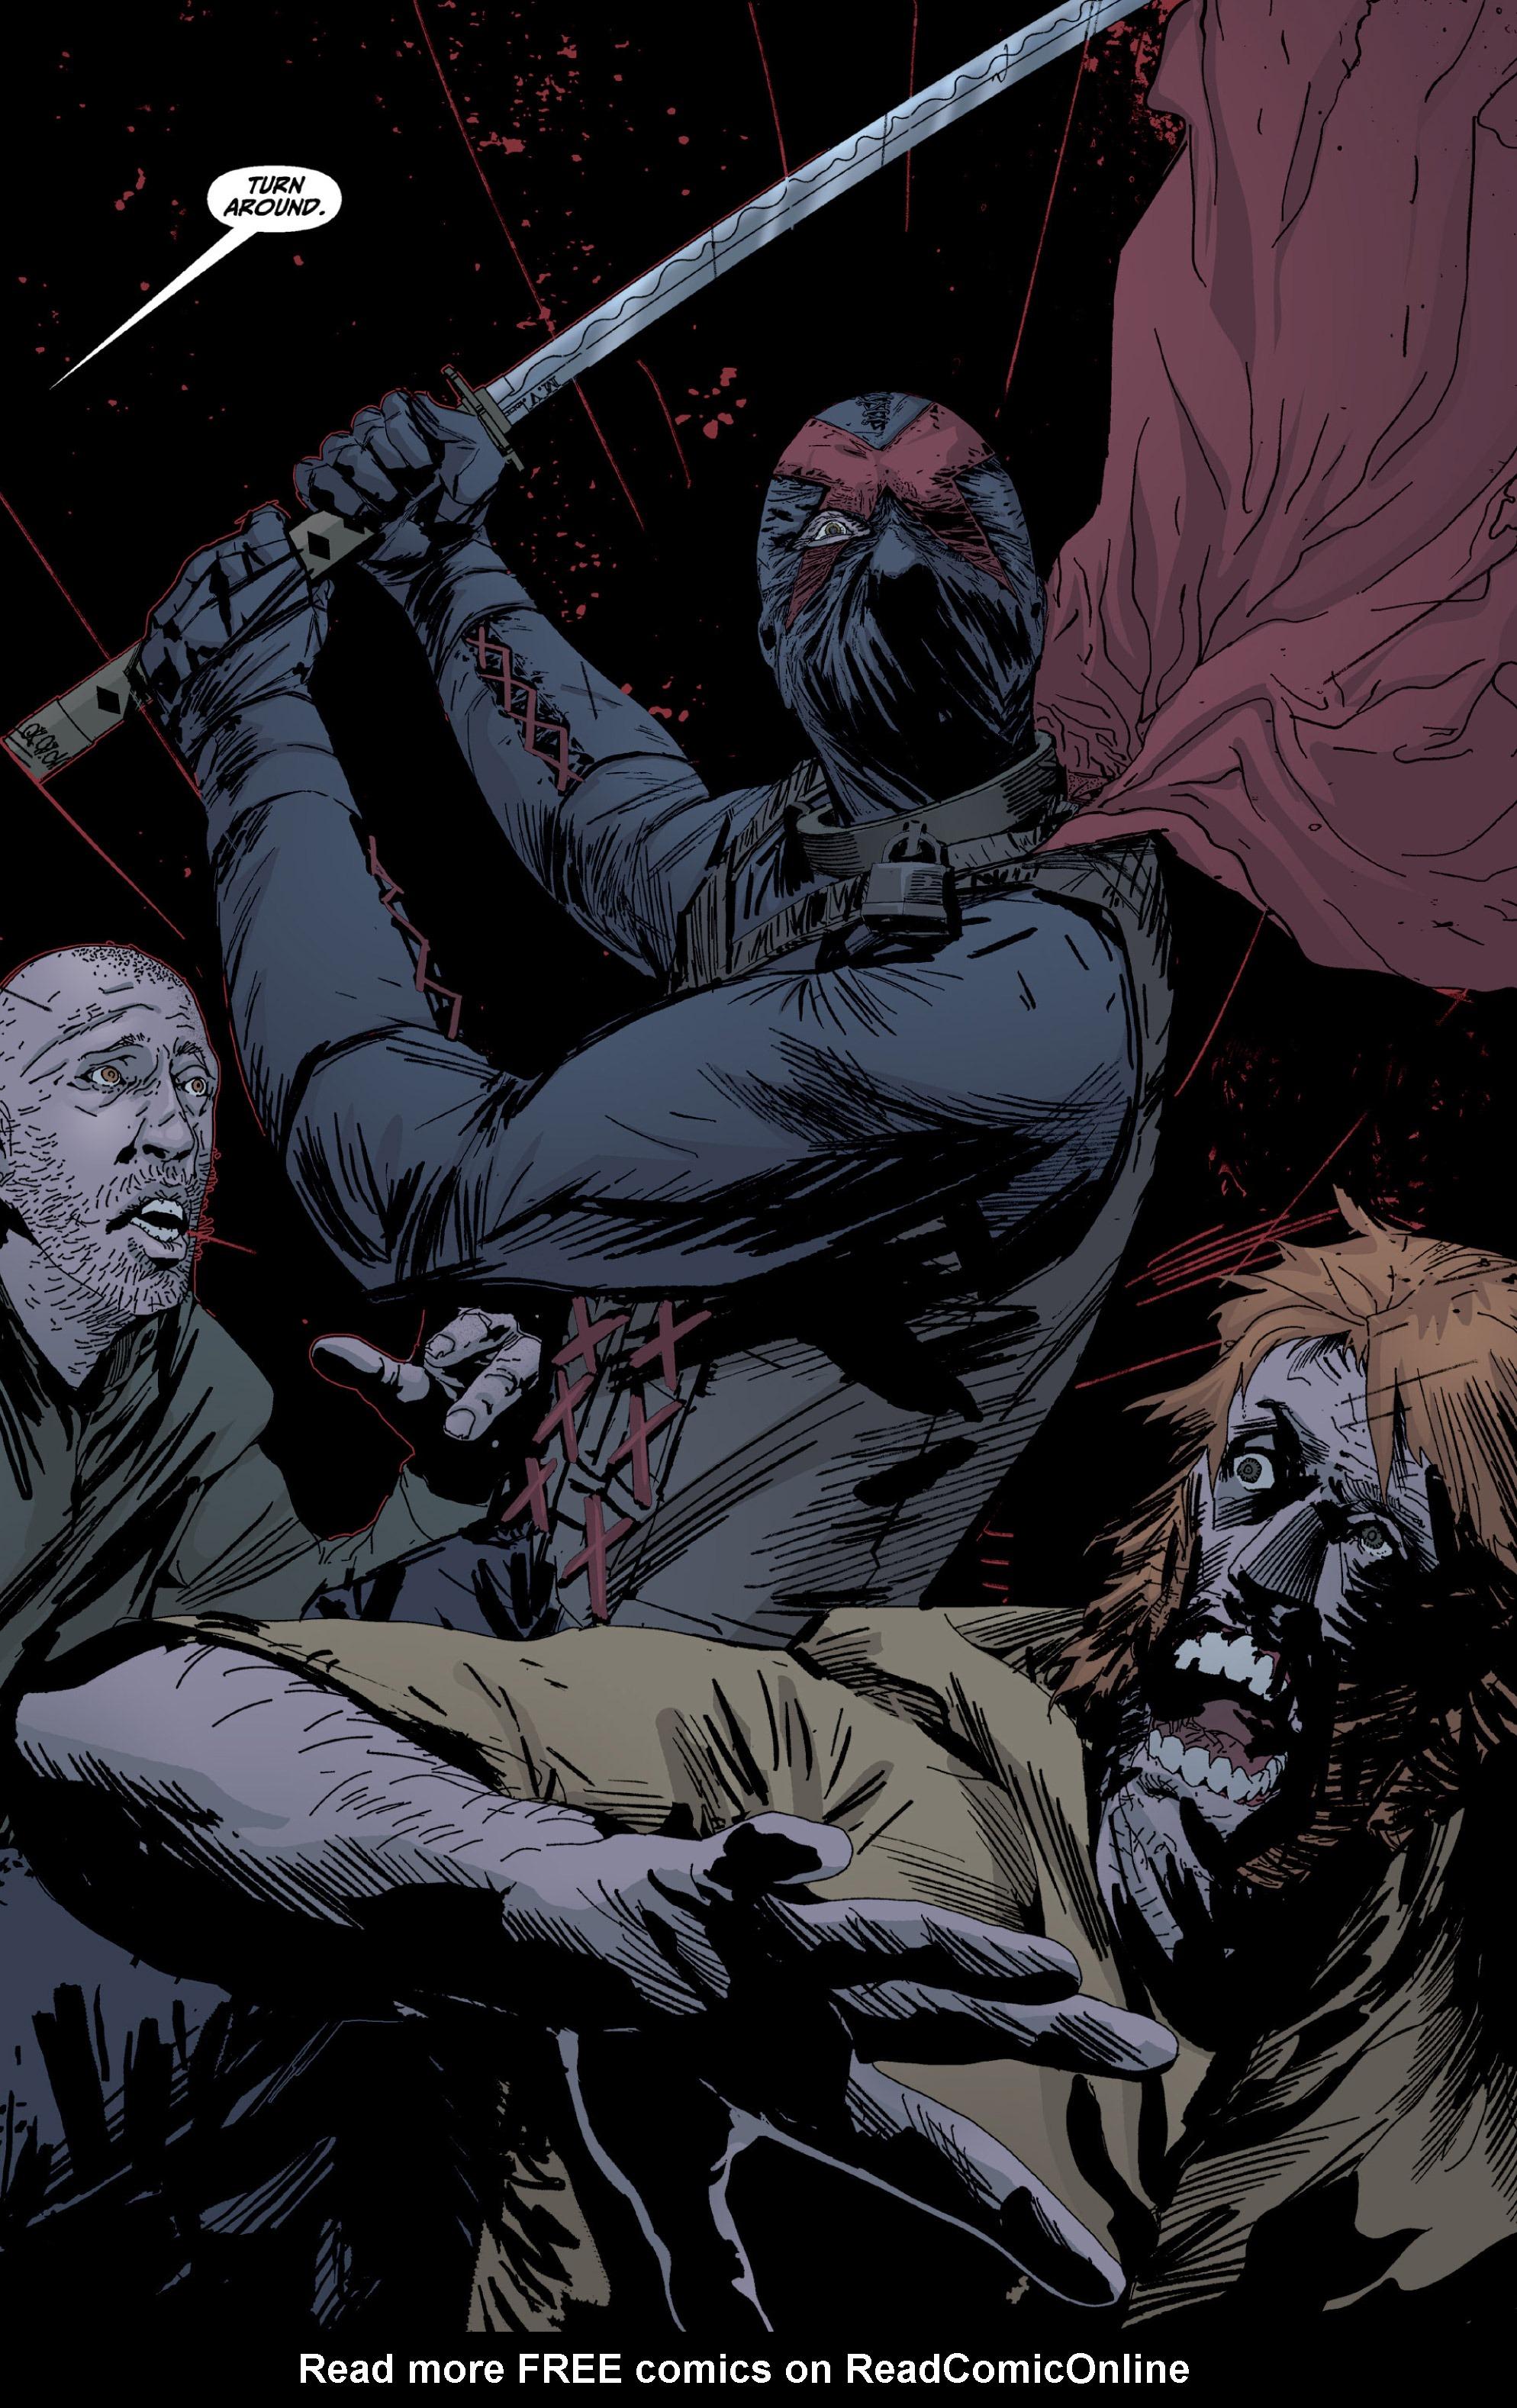 Read online X: Big Bad comic -  Issue # Full - 88